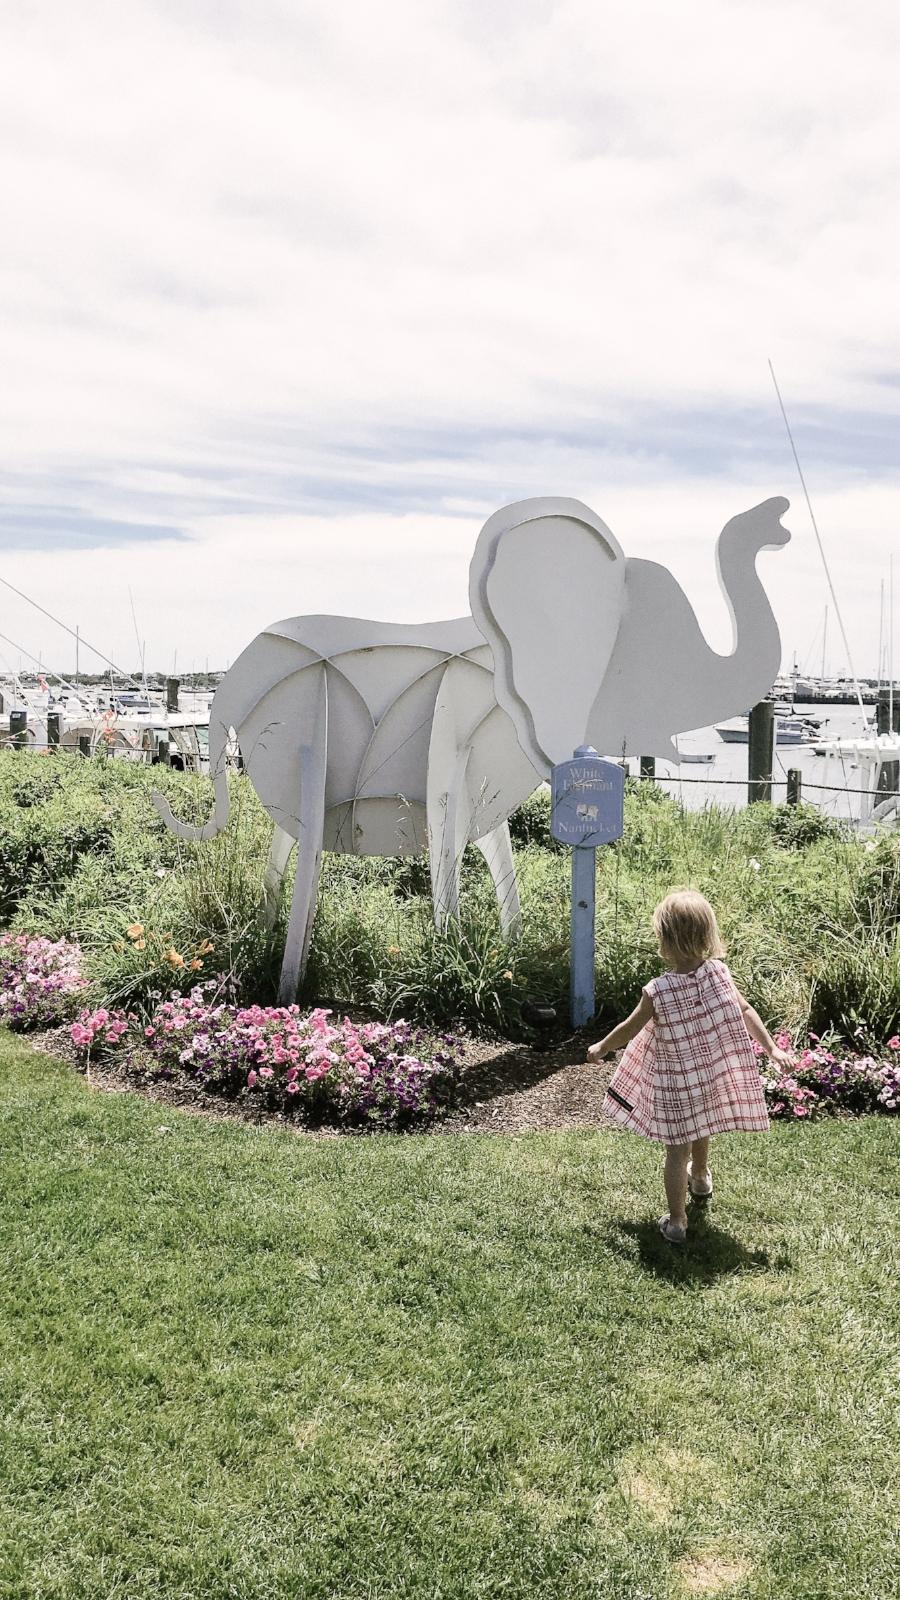 Nantucket Lilies and Lambs